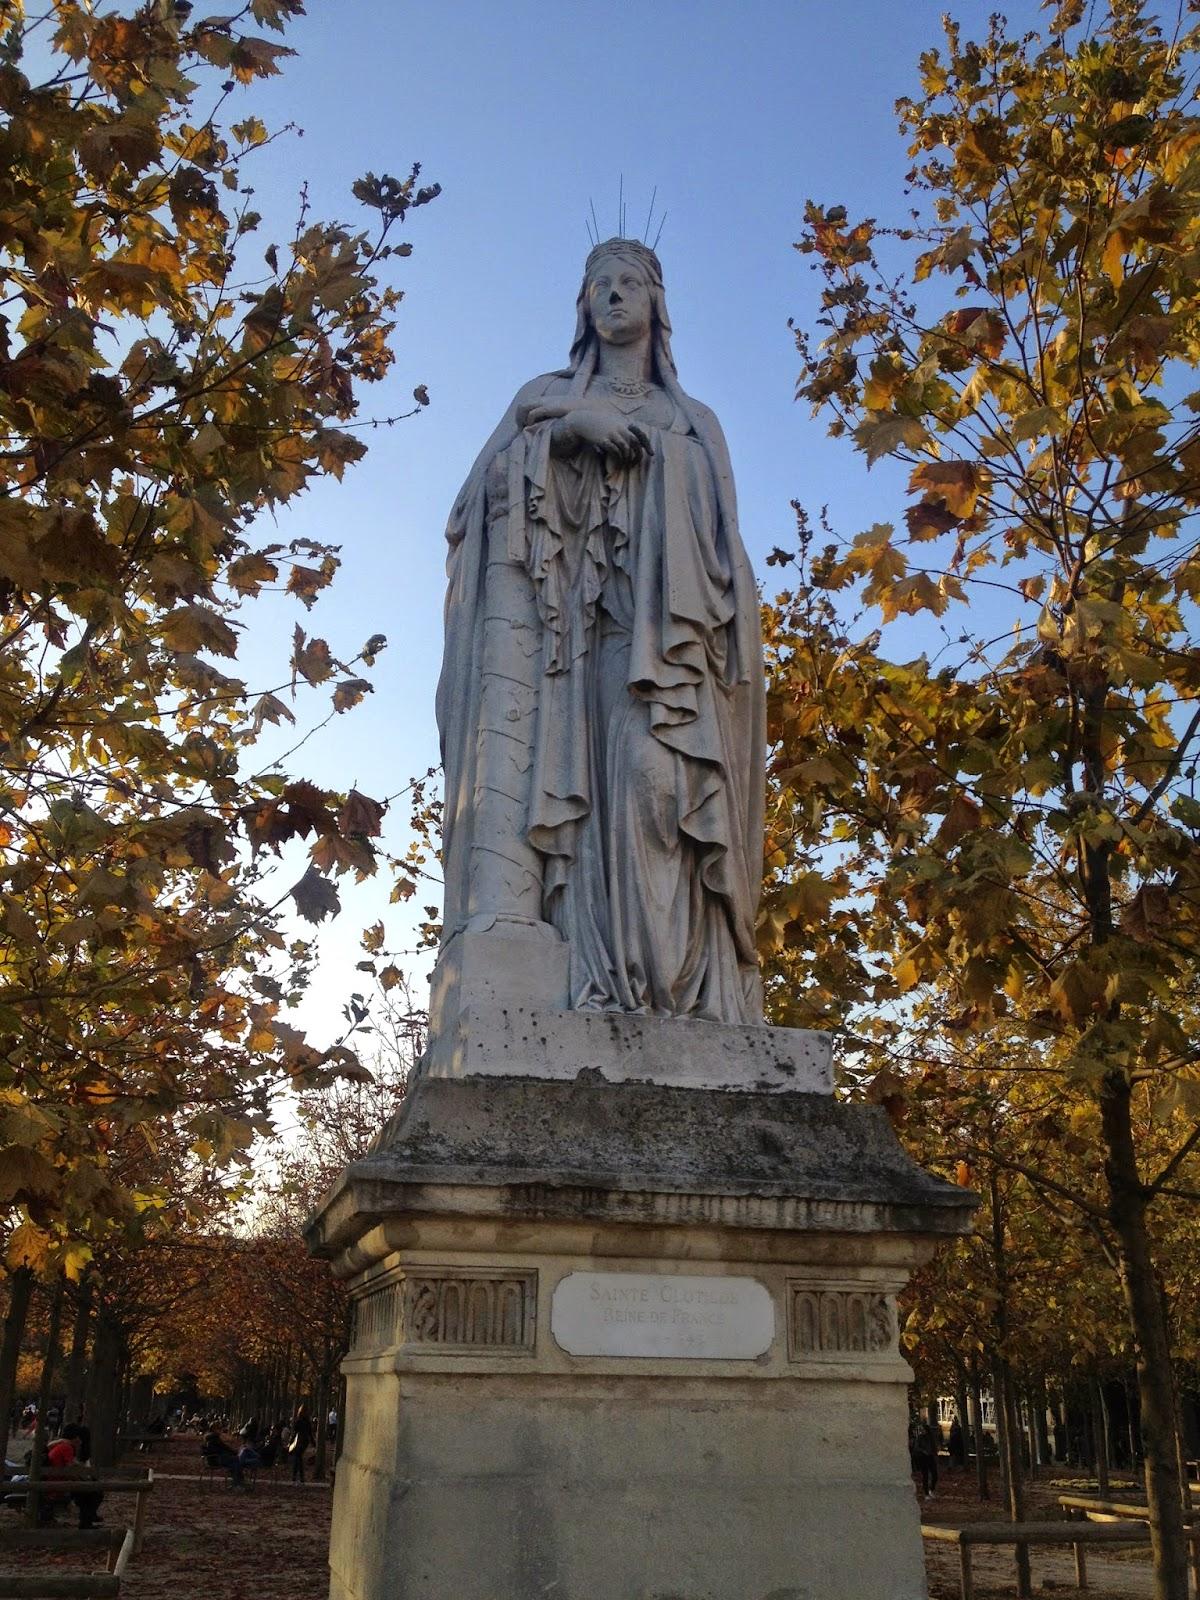 Statue of St. Clothilde, Jardin du Luxembourg, Paris